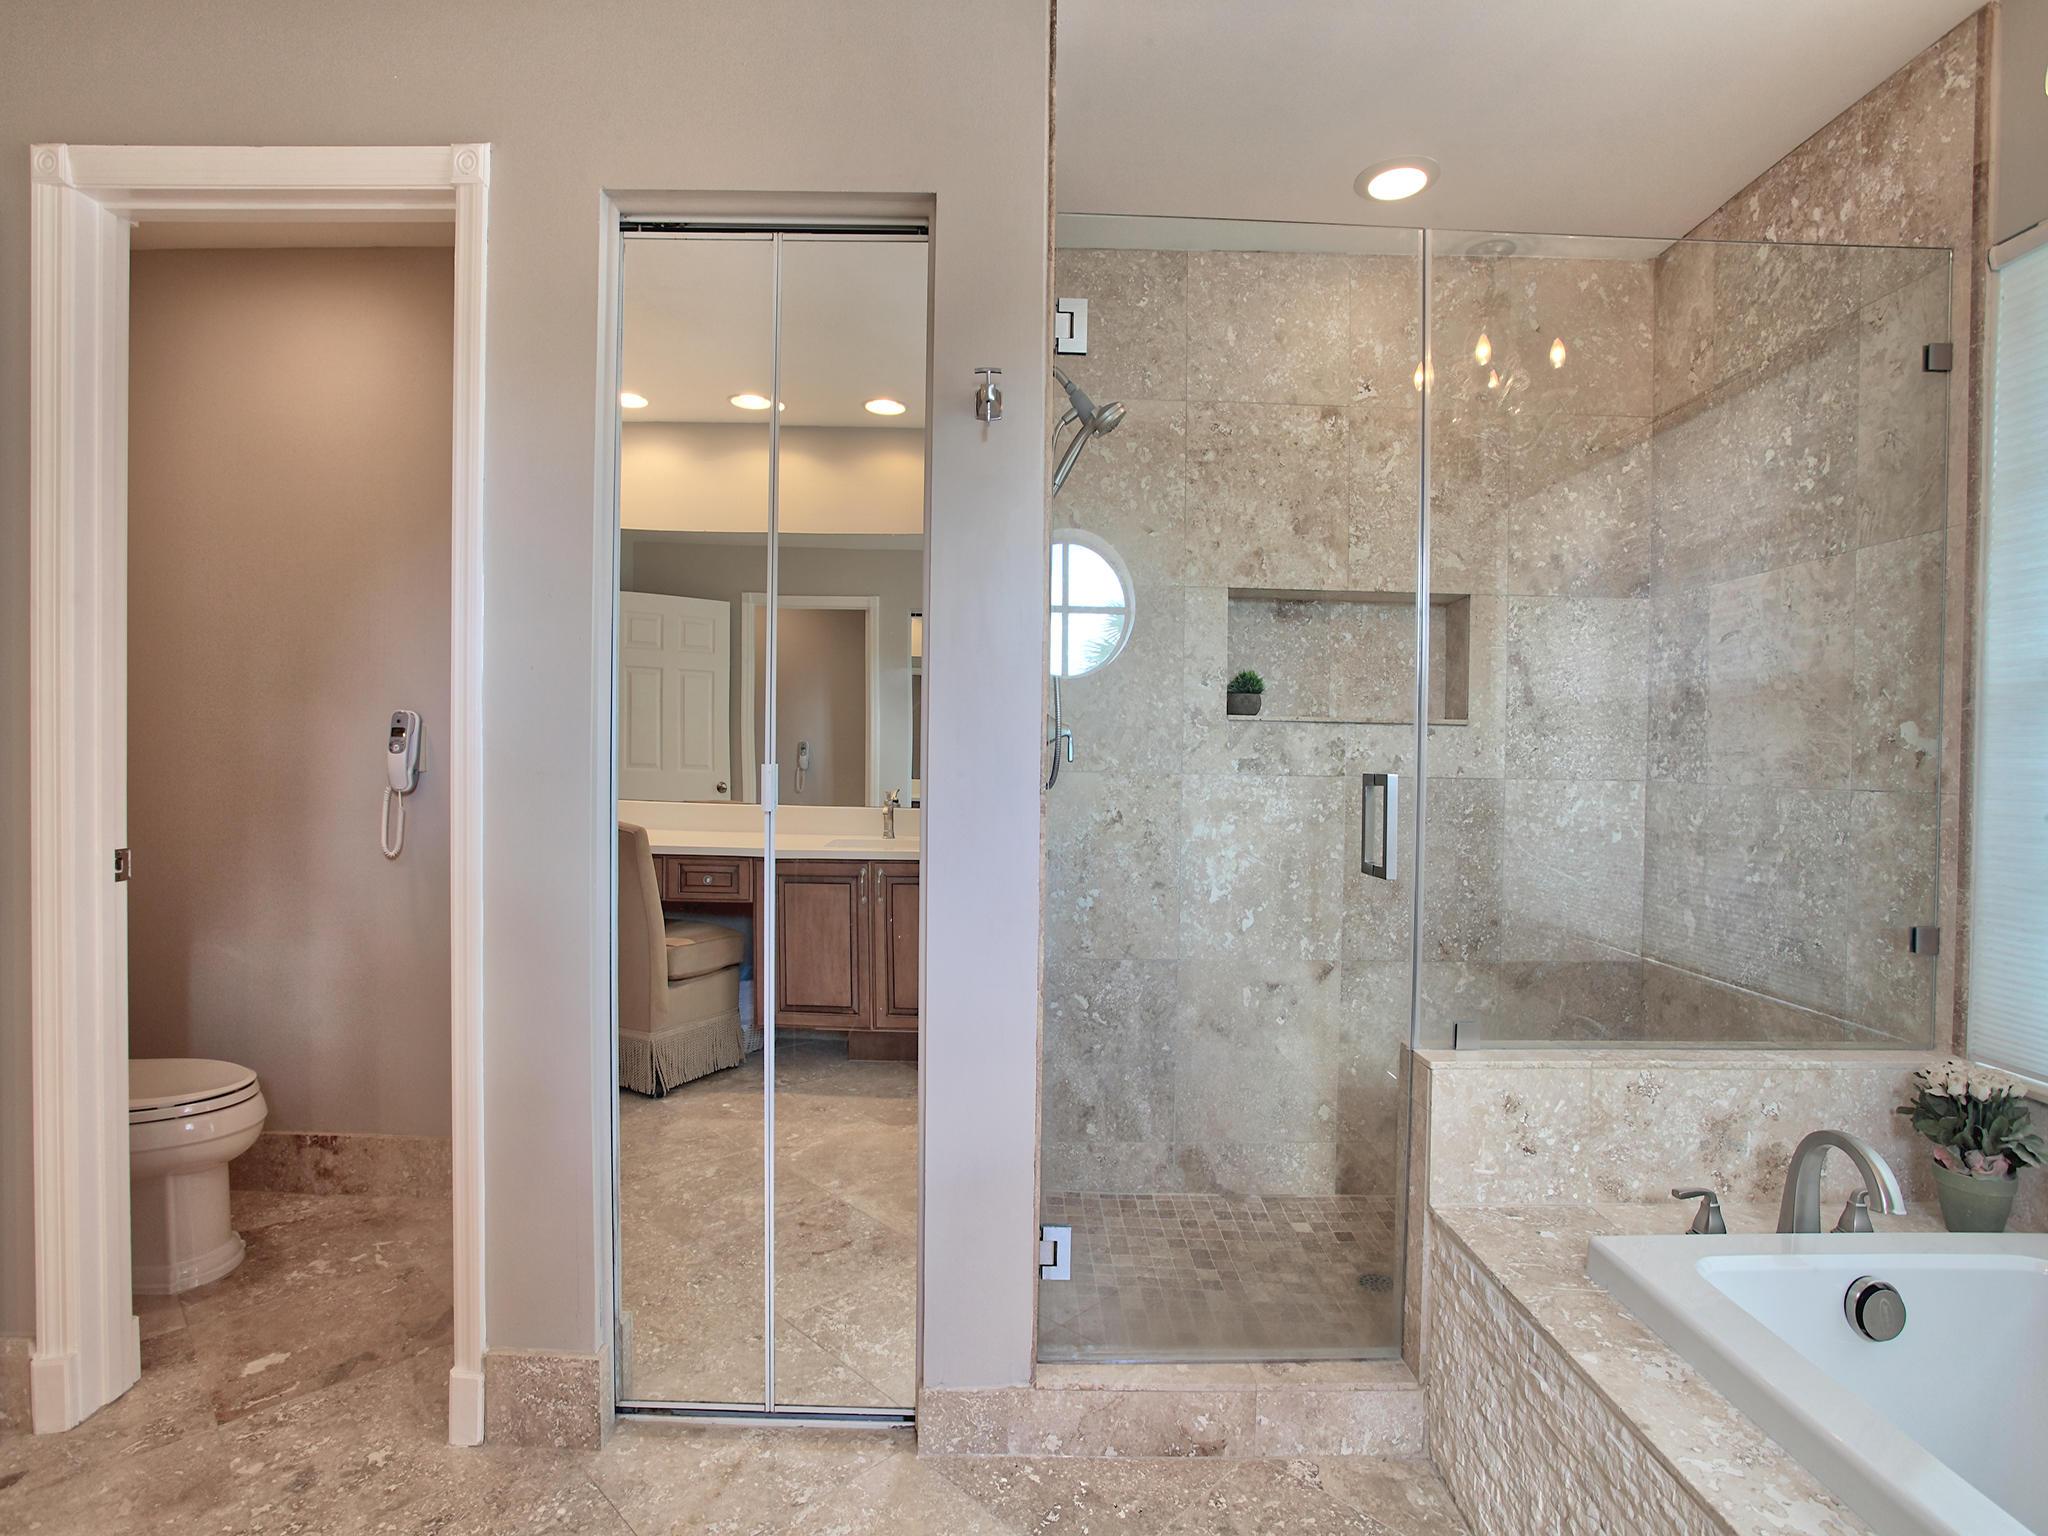 10872 Tea Olive Lane, Boca Raton, FL 33498 (MLS# RX-10469671 ... on a full basement, a full sink, a full window, a full glass, a full pantry, a full garage, a full garden, a full library, a full kitchen, a full office, a full family, a full closet, a full bathtub,